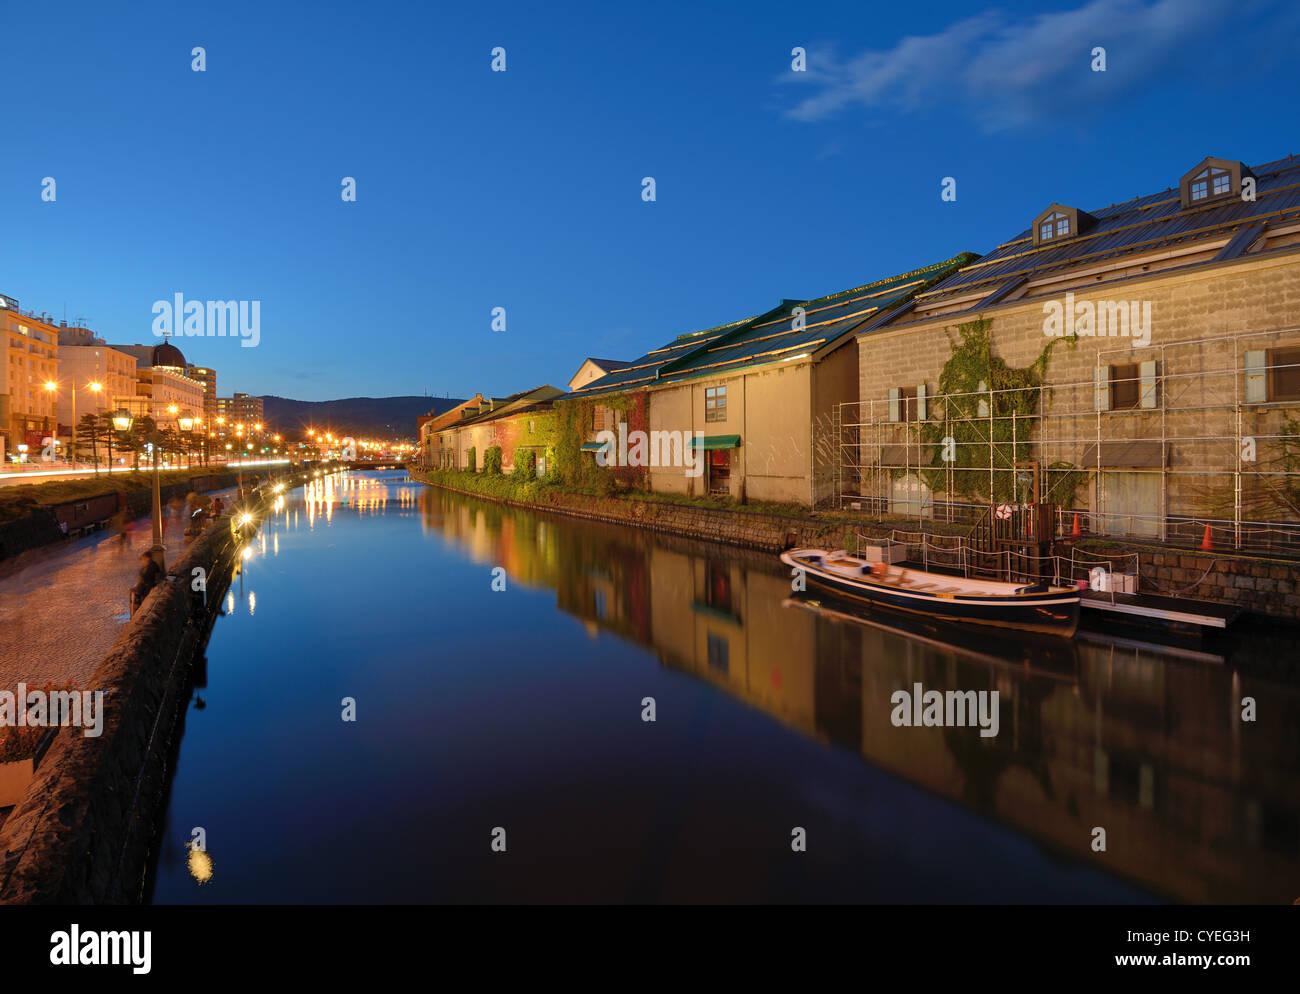 Historic Otaru Canals in Otaru, Hokkaido Prefecture, Japan. - Stock Image